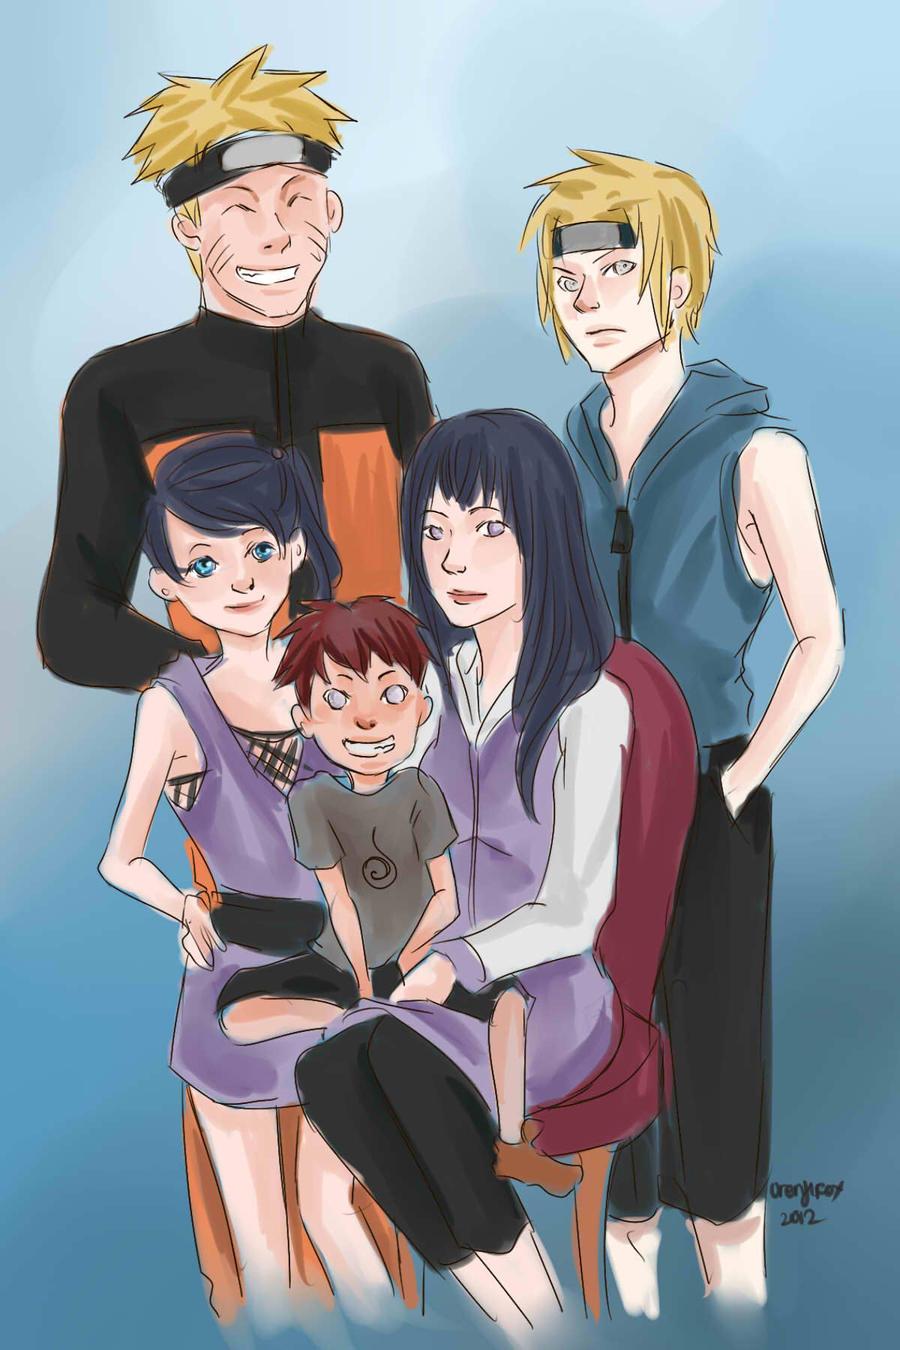 naruhina family portrait by nikky93 on DeviantArt